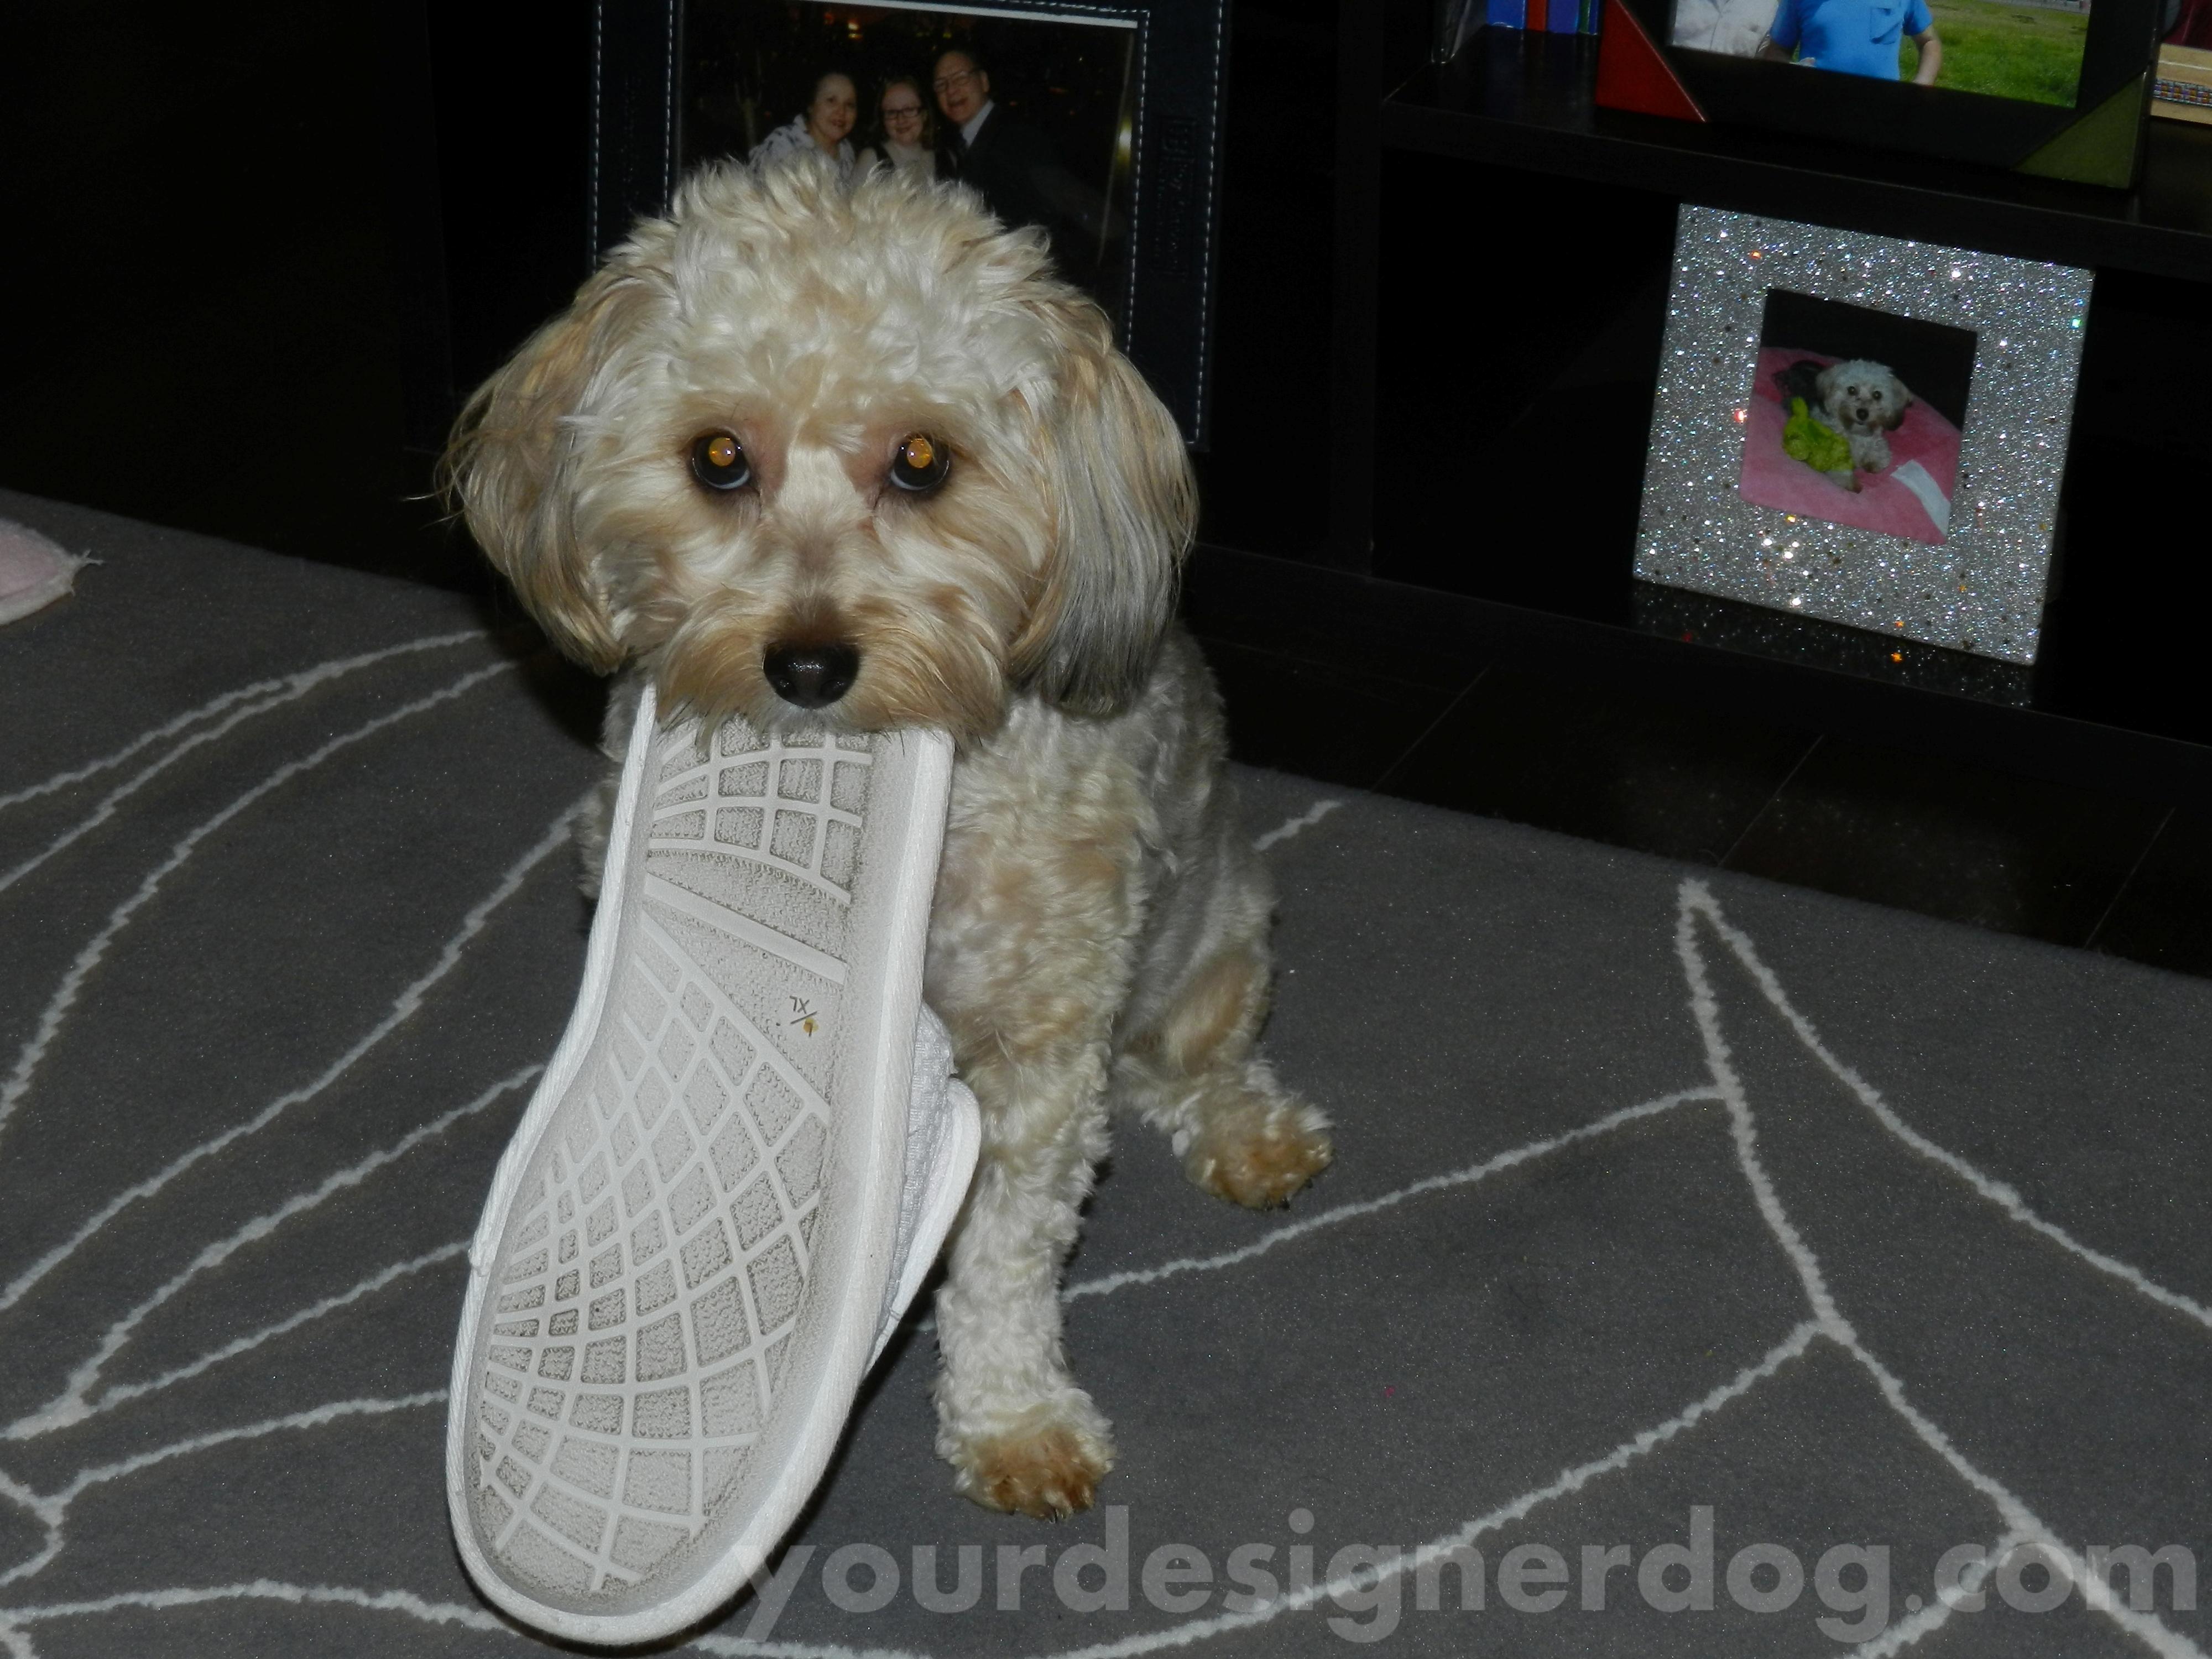 Sadie the Slipper Stealer